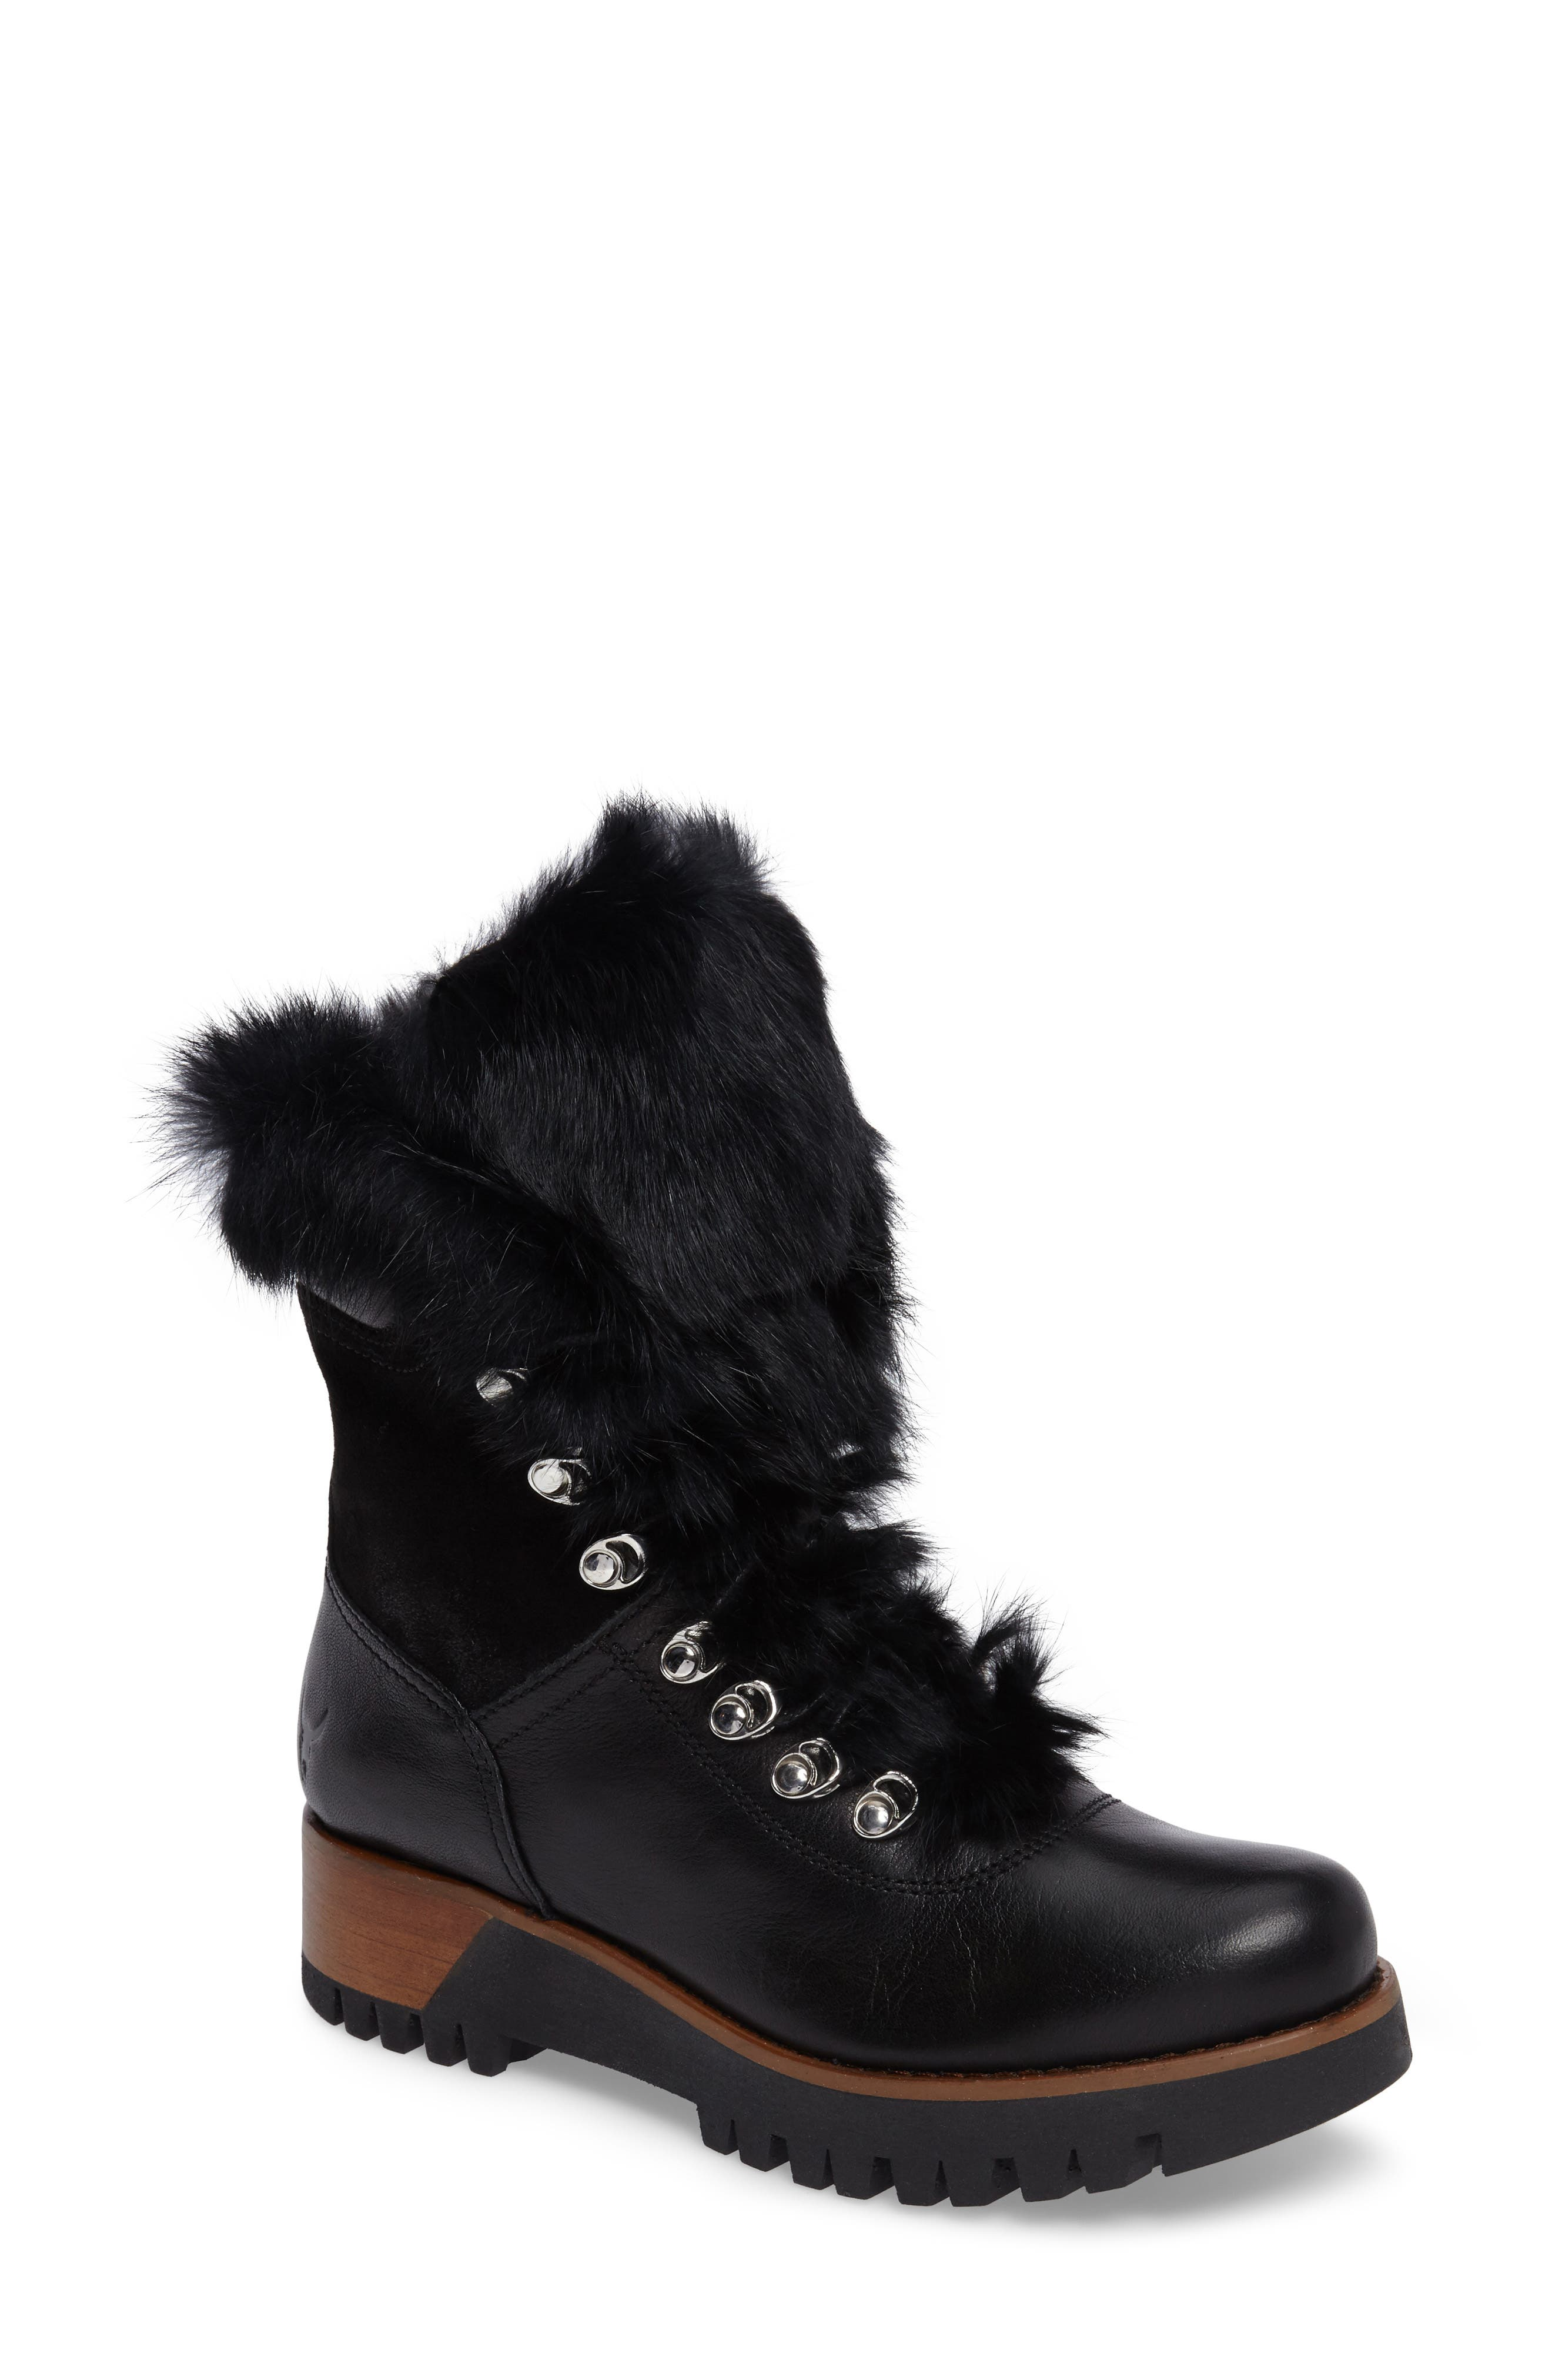 Alternate Image 1 Selected - Rudsak Tsar Genuine Rabbit Fur Boot (Women)